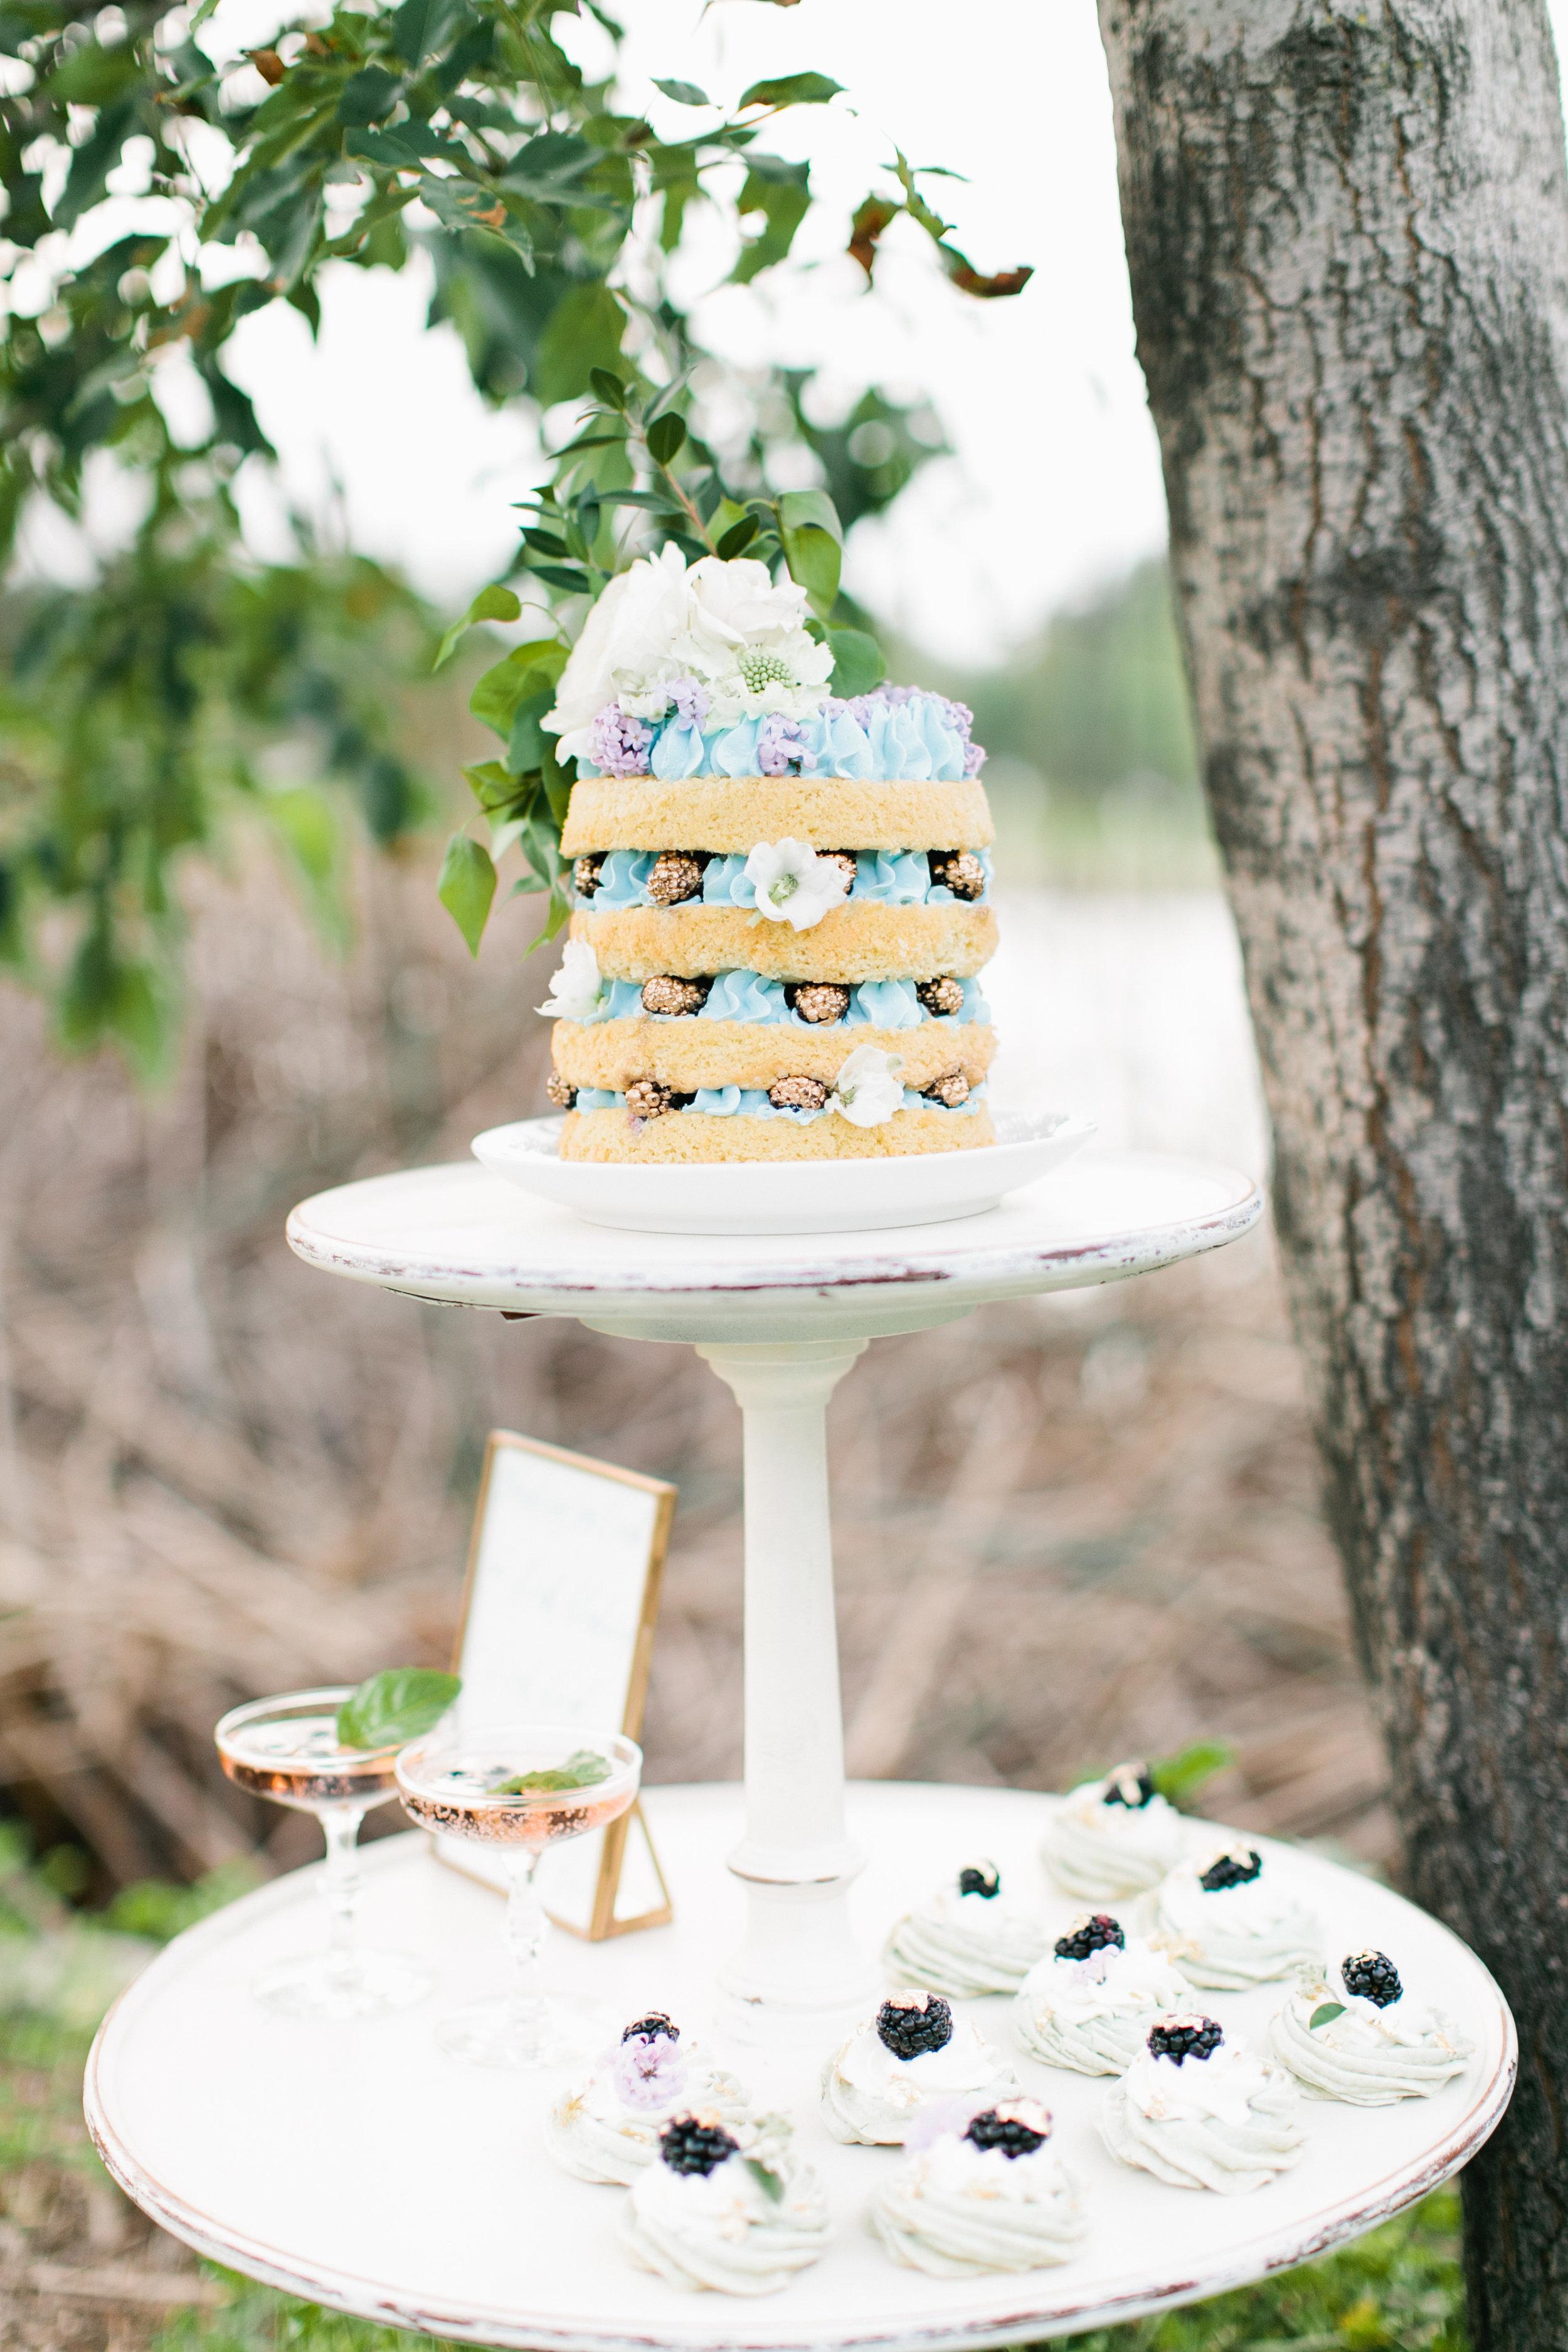 Naked sponge cake with bright blue buttercream, gold blackberries, fresh florals. Photo: Sorella Muse